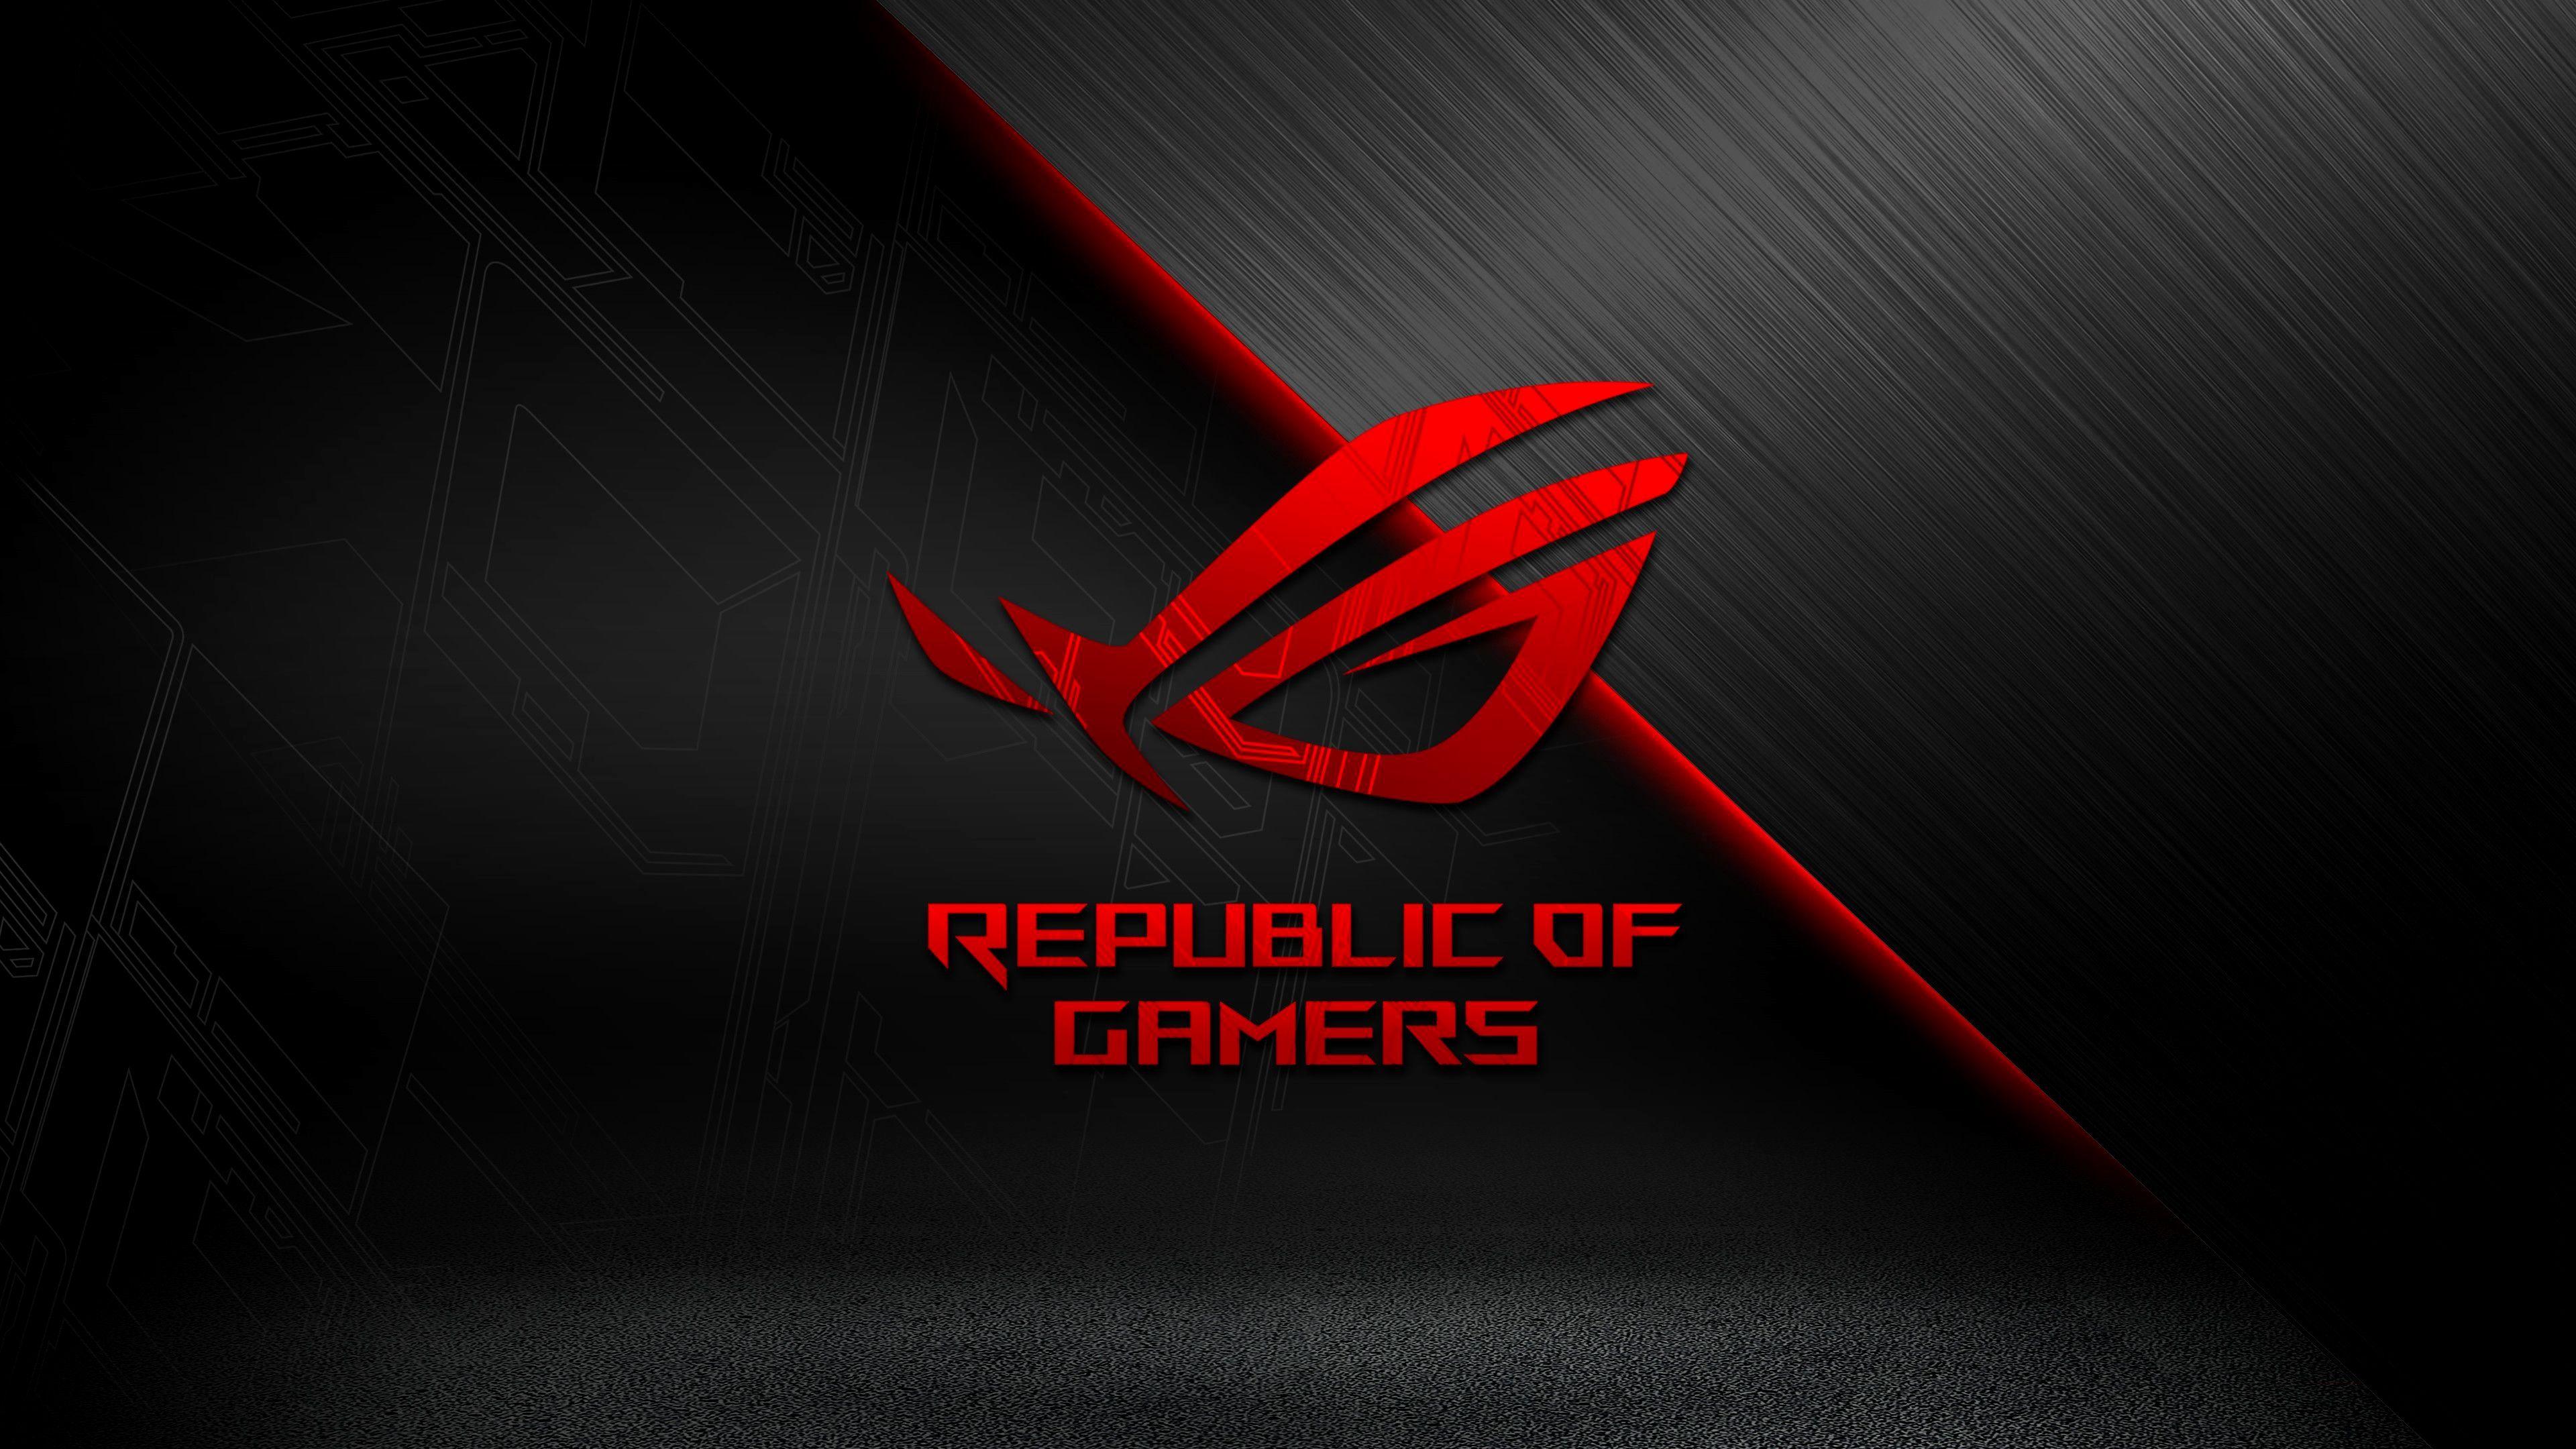 Wallpaper 4K Gaming Asus Gallery Check more at https